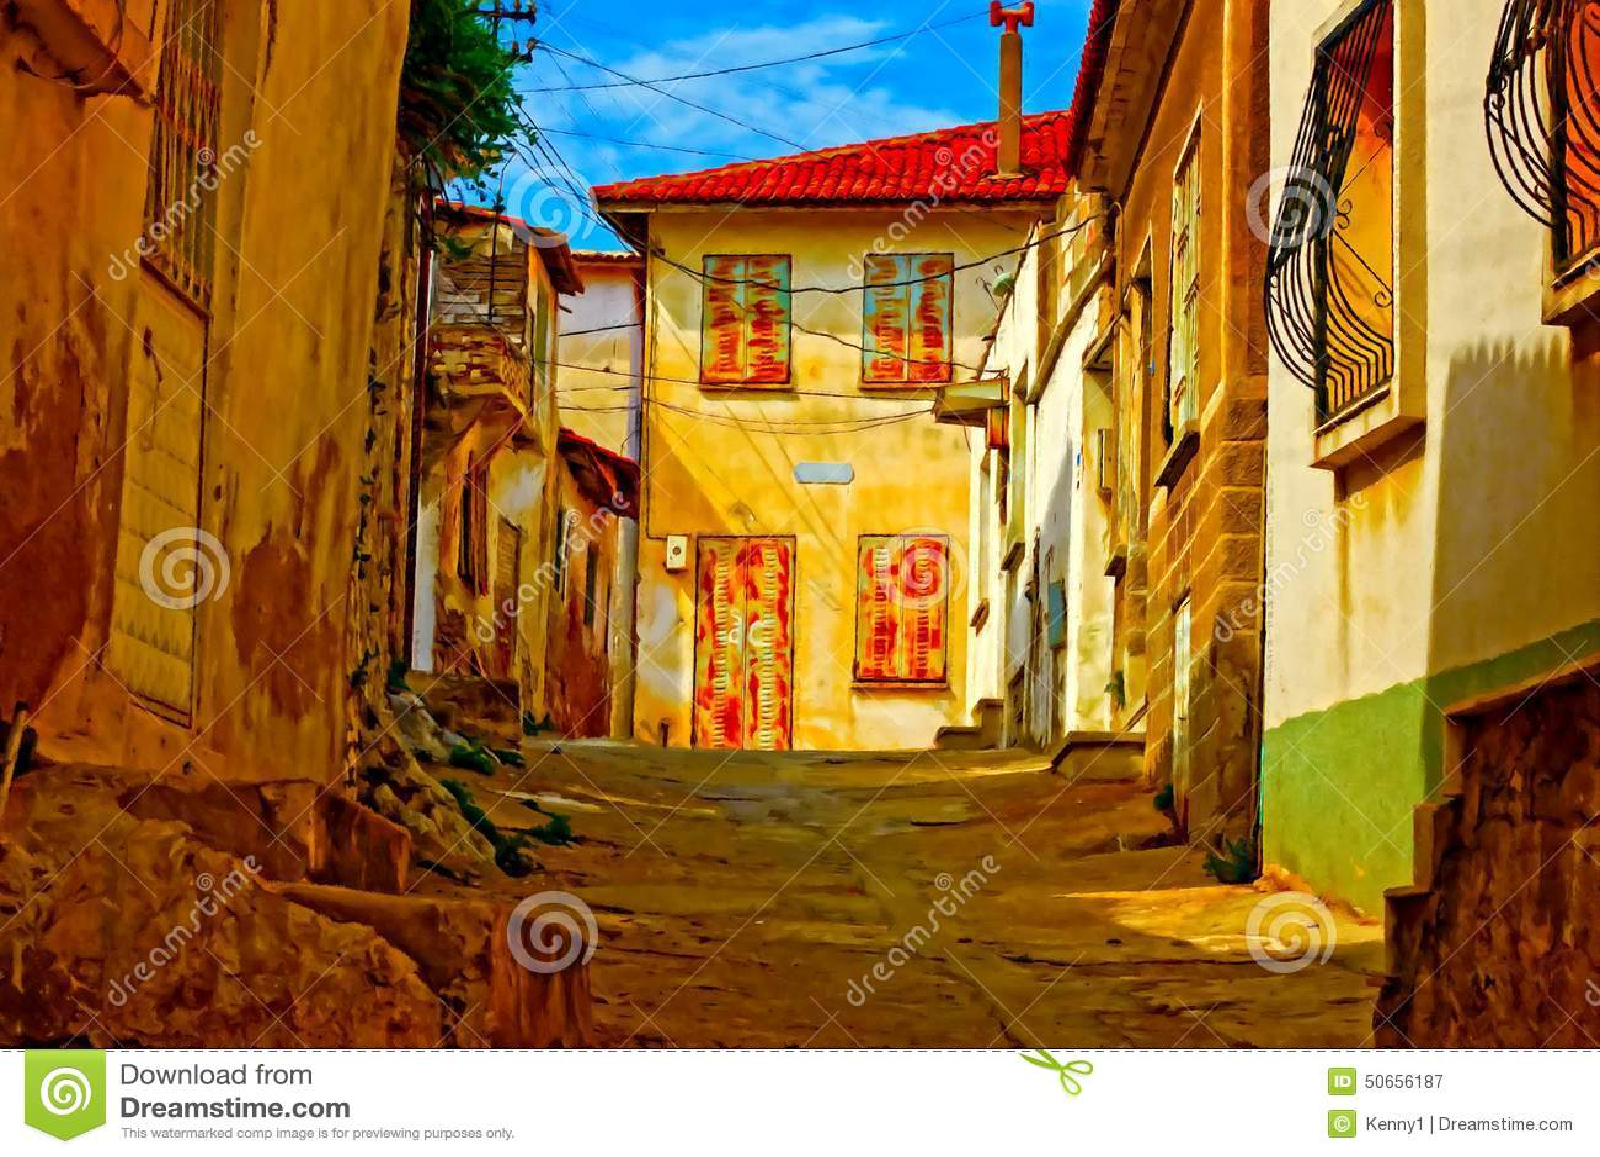 peinture de digital d 39 une rue turque de village illustration stock illustration du digital. Black Bedroom Furniture Sets. Home Design Ideas